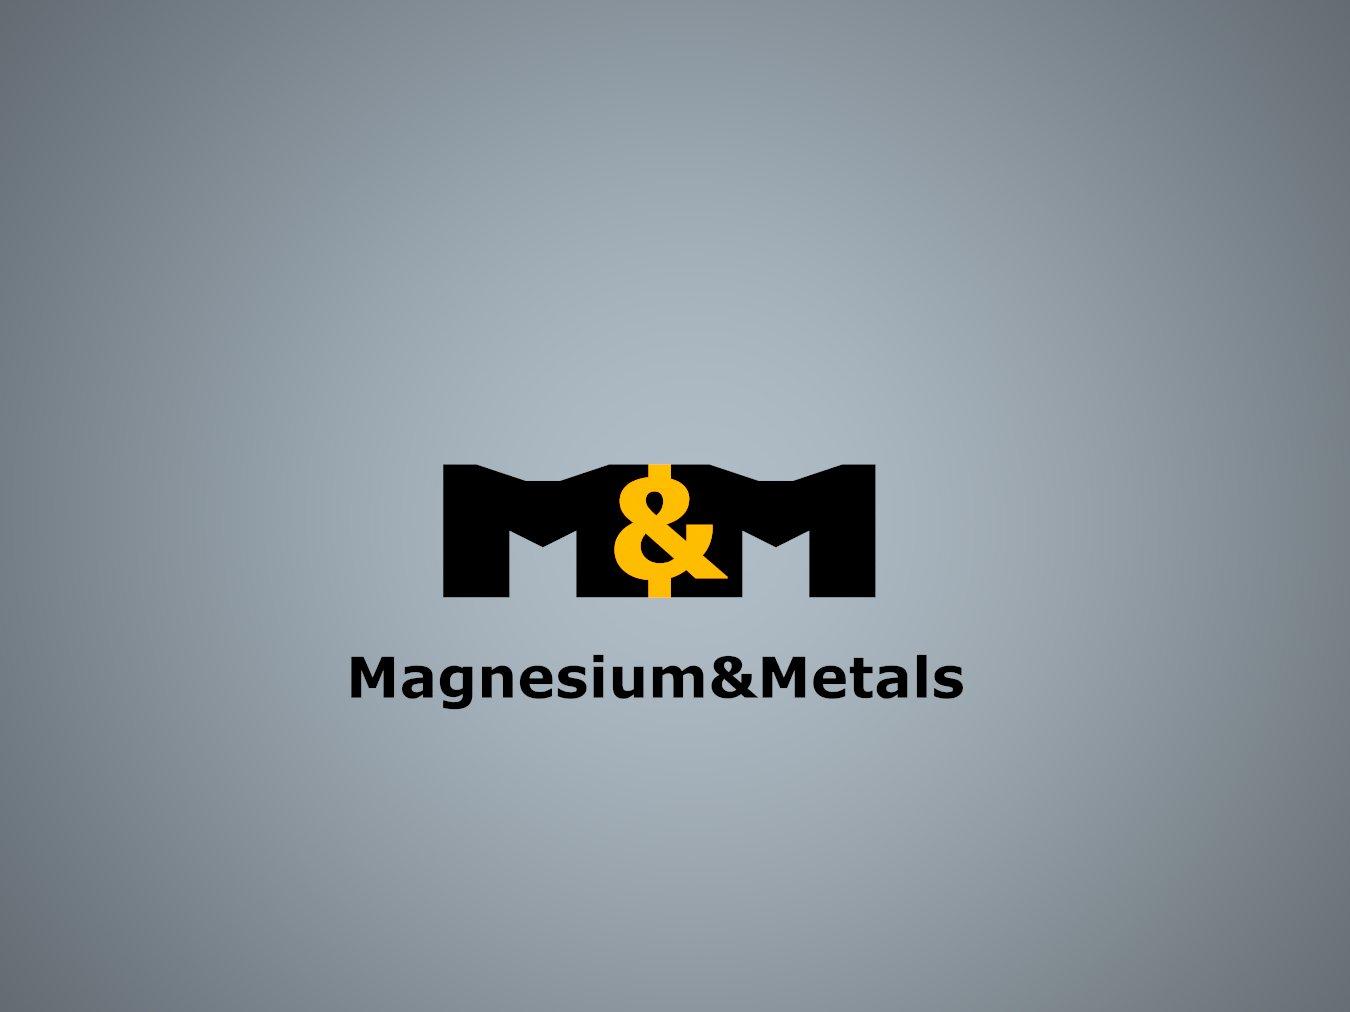 Логотип для проекта Magnesium&Metals фото f_4e92c565dba1e.jpg